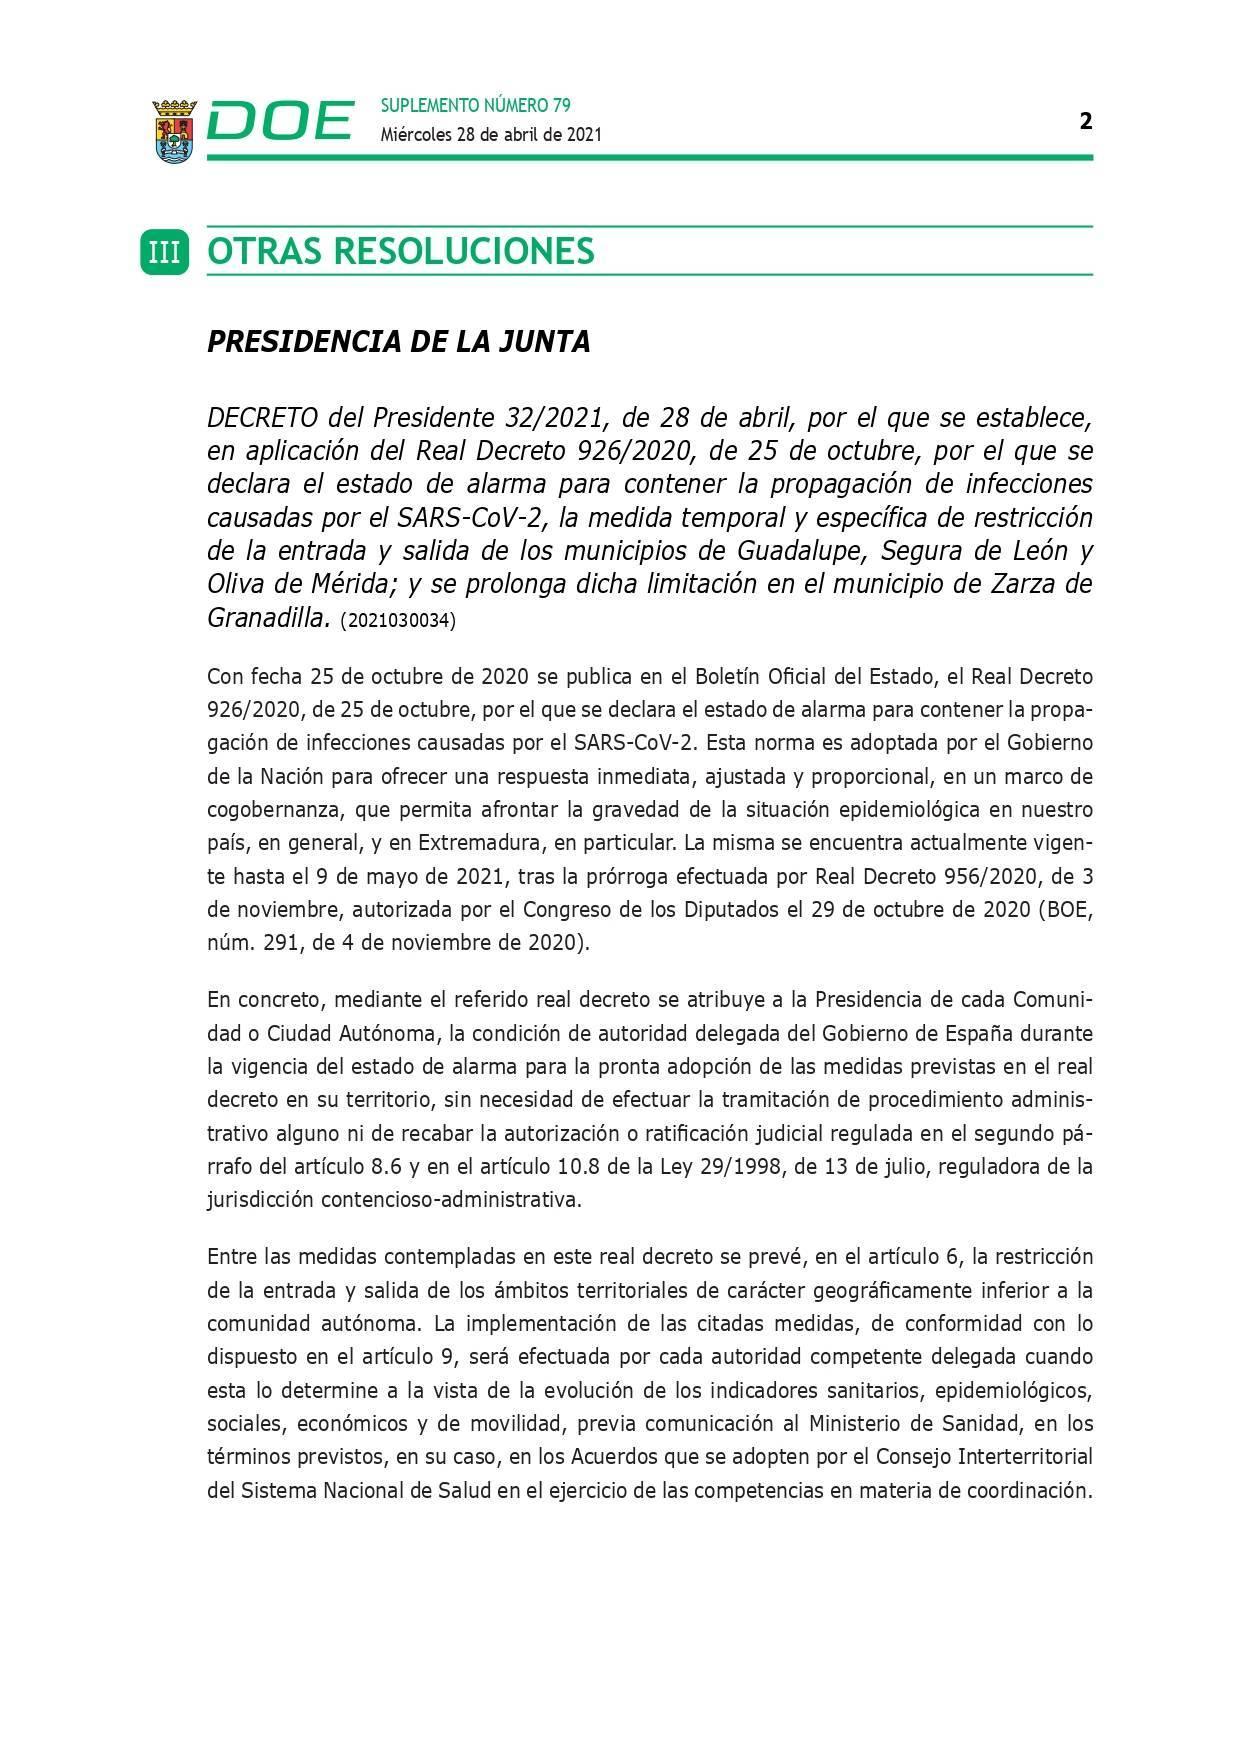 Cierre perimetral por COVID-19 (abril 2021) - Guadalupe (Cáceres) 2